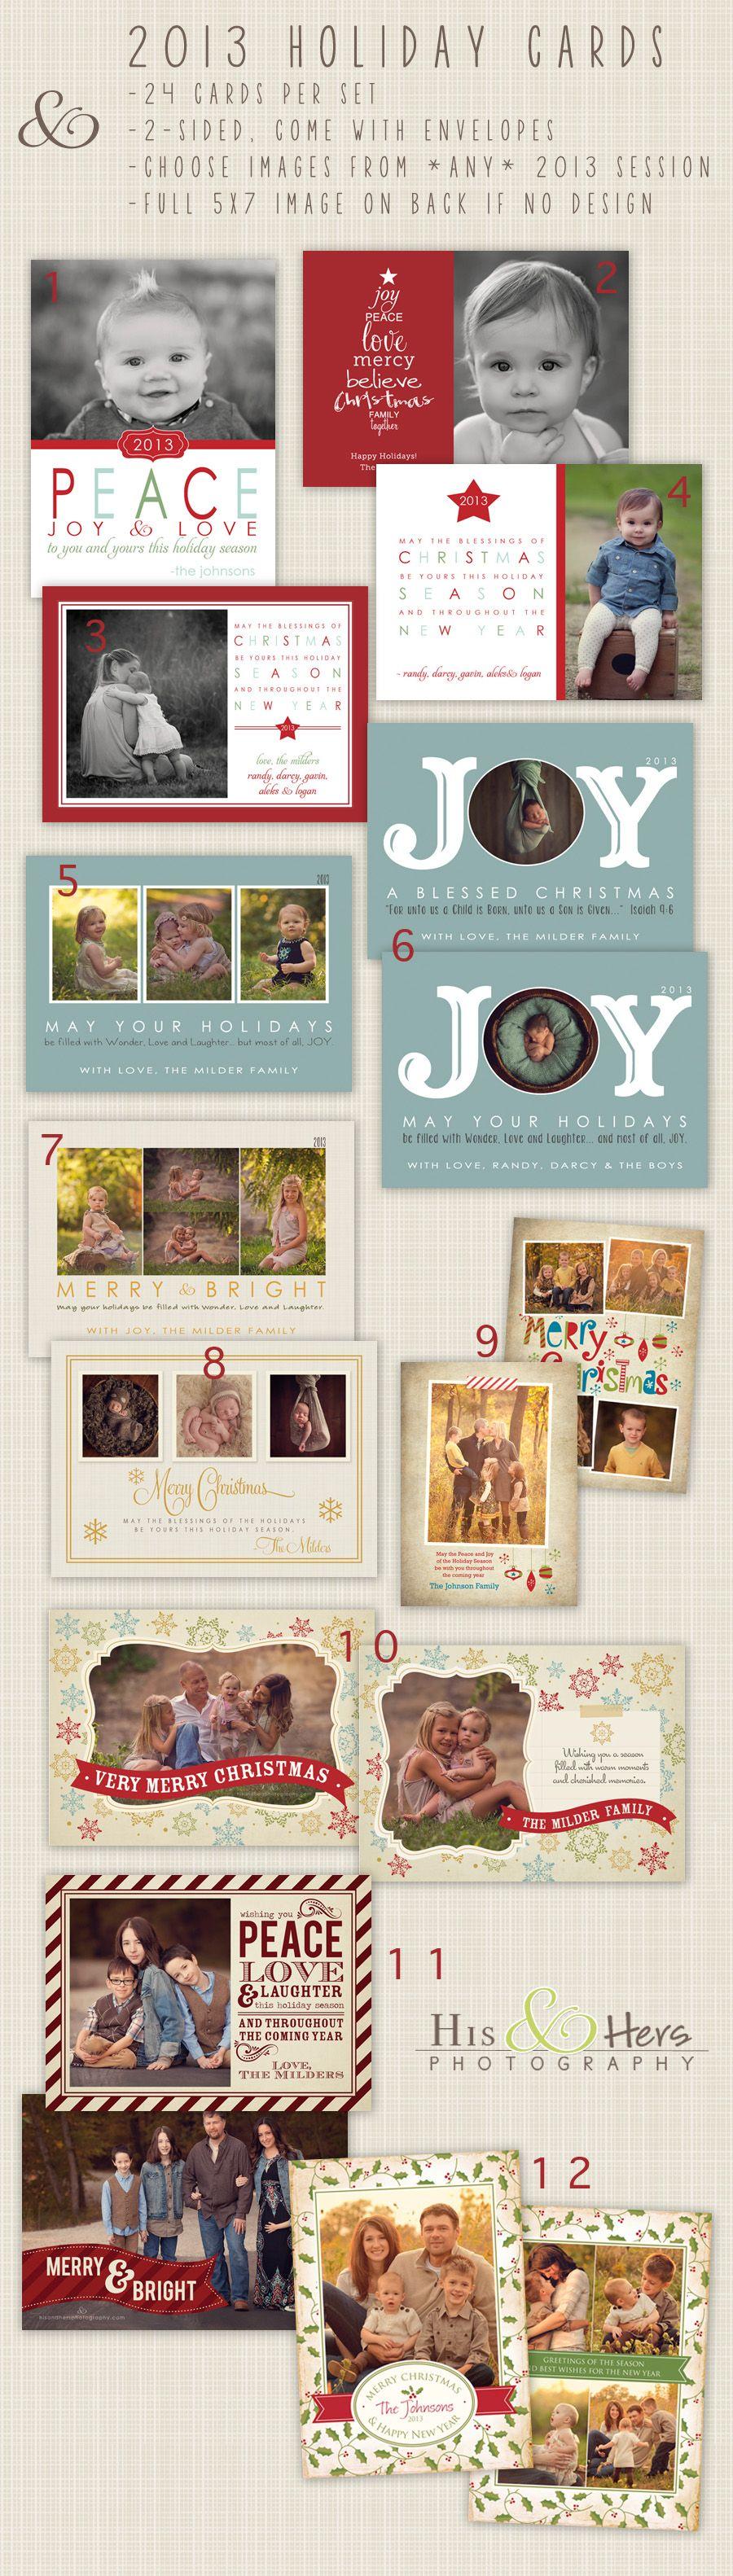 2013 Christmas & Holiday Cards